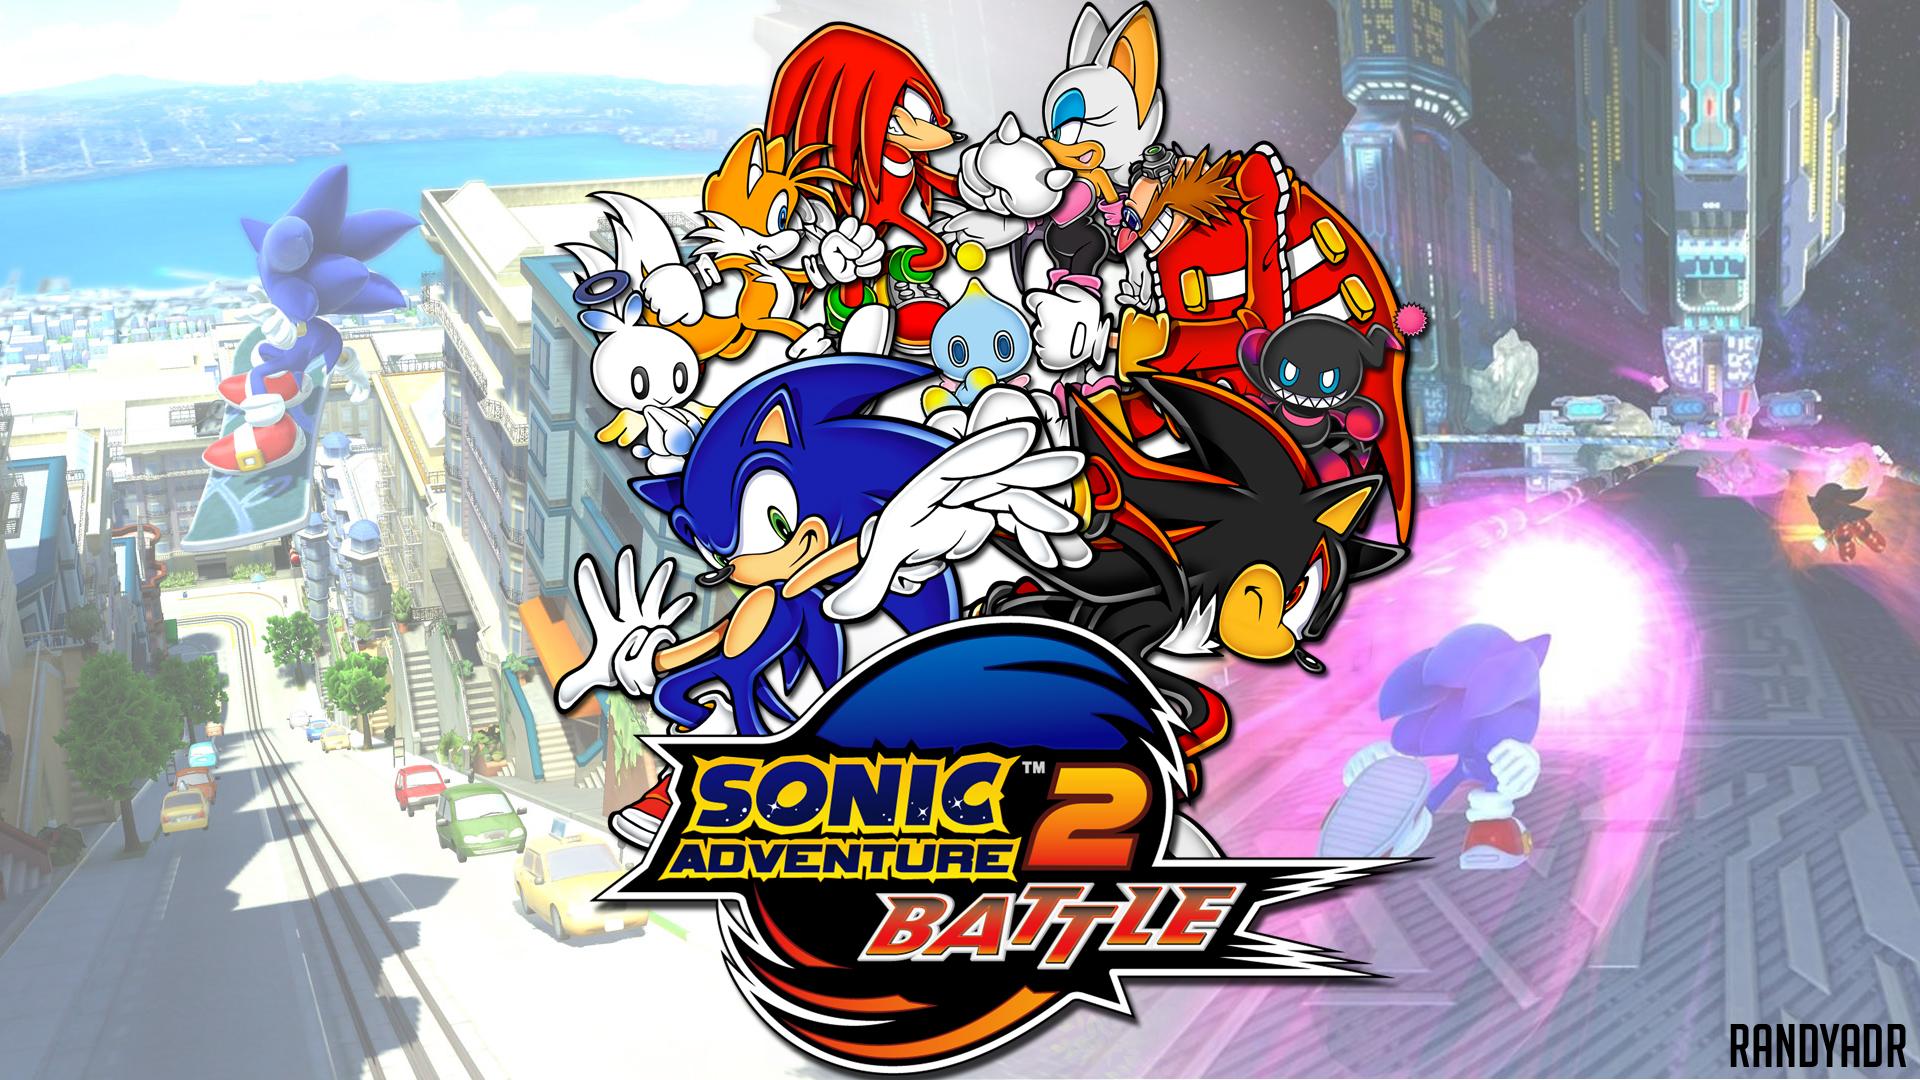 Sonic Adventure 2 Battle Hd Wallpaper Background Image 1920x1080